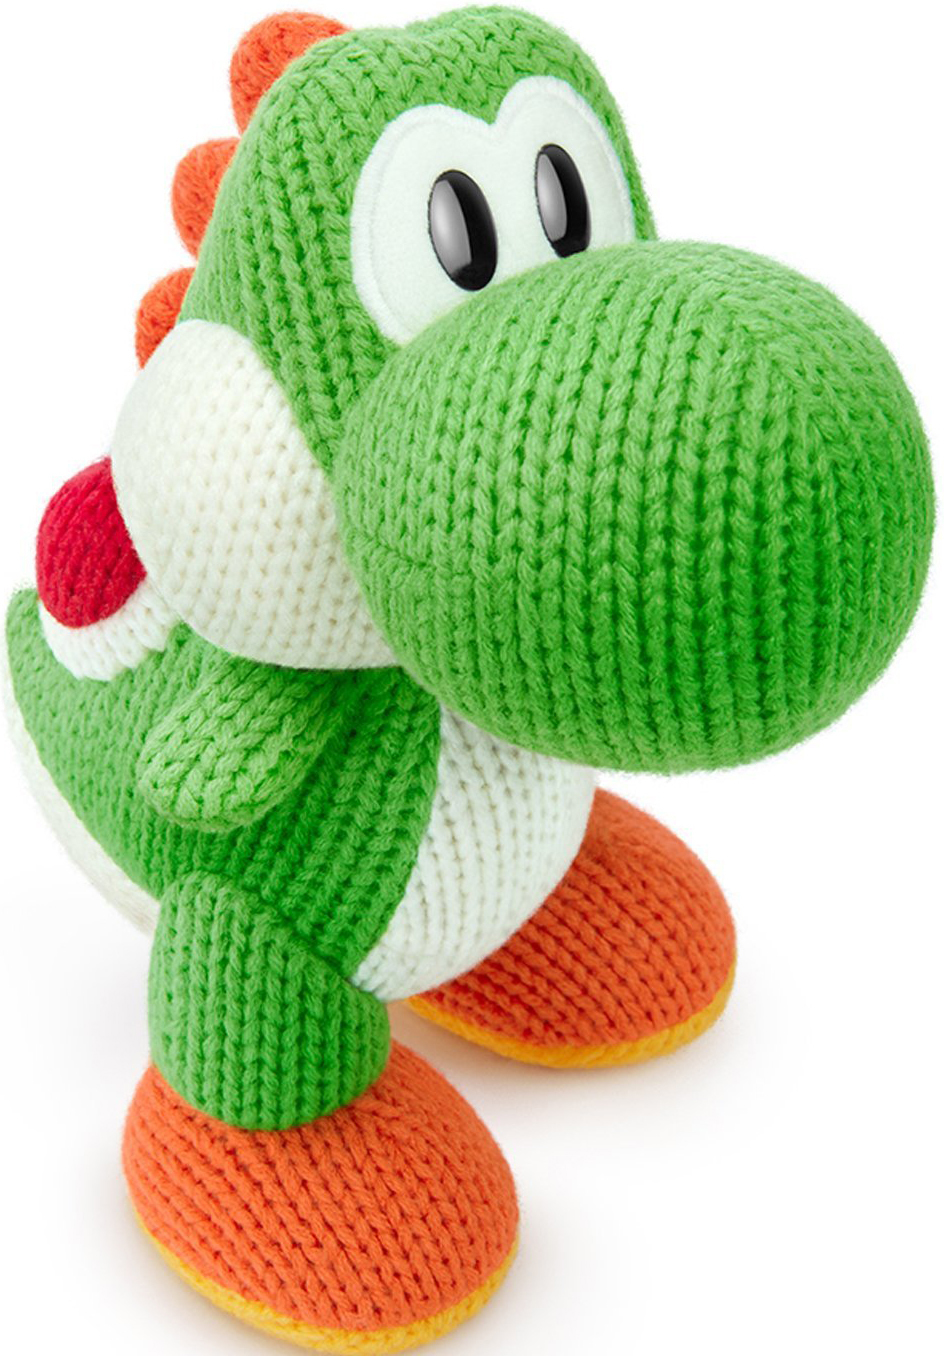 Amiibo - Green Yarn Yoshi